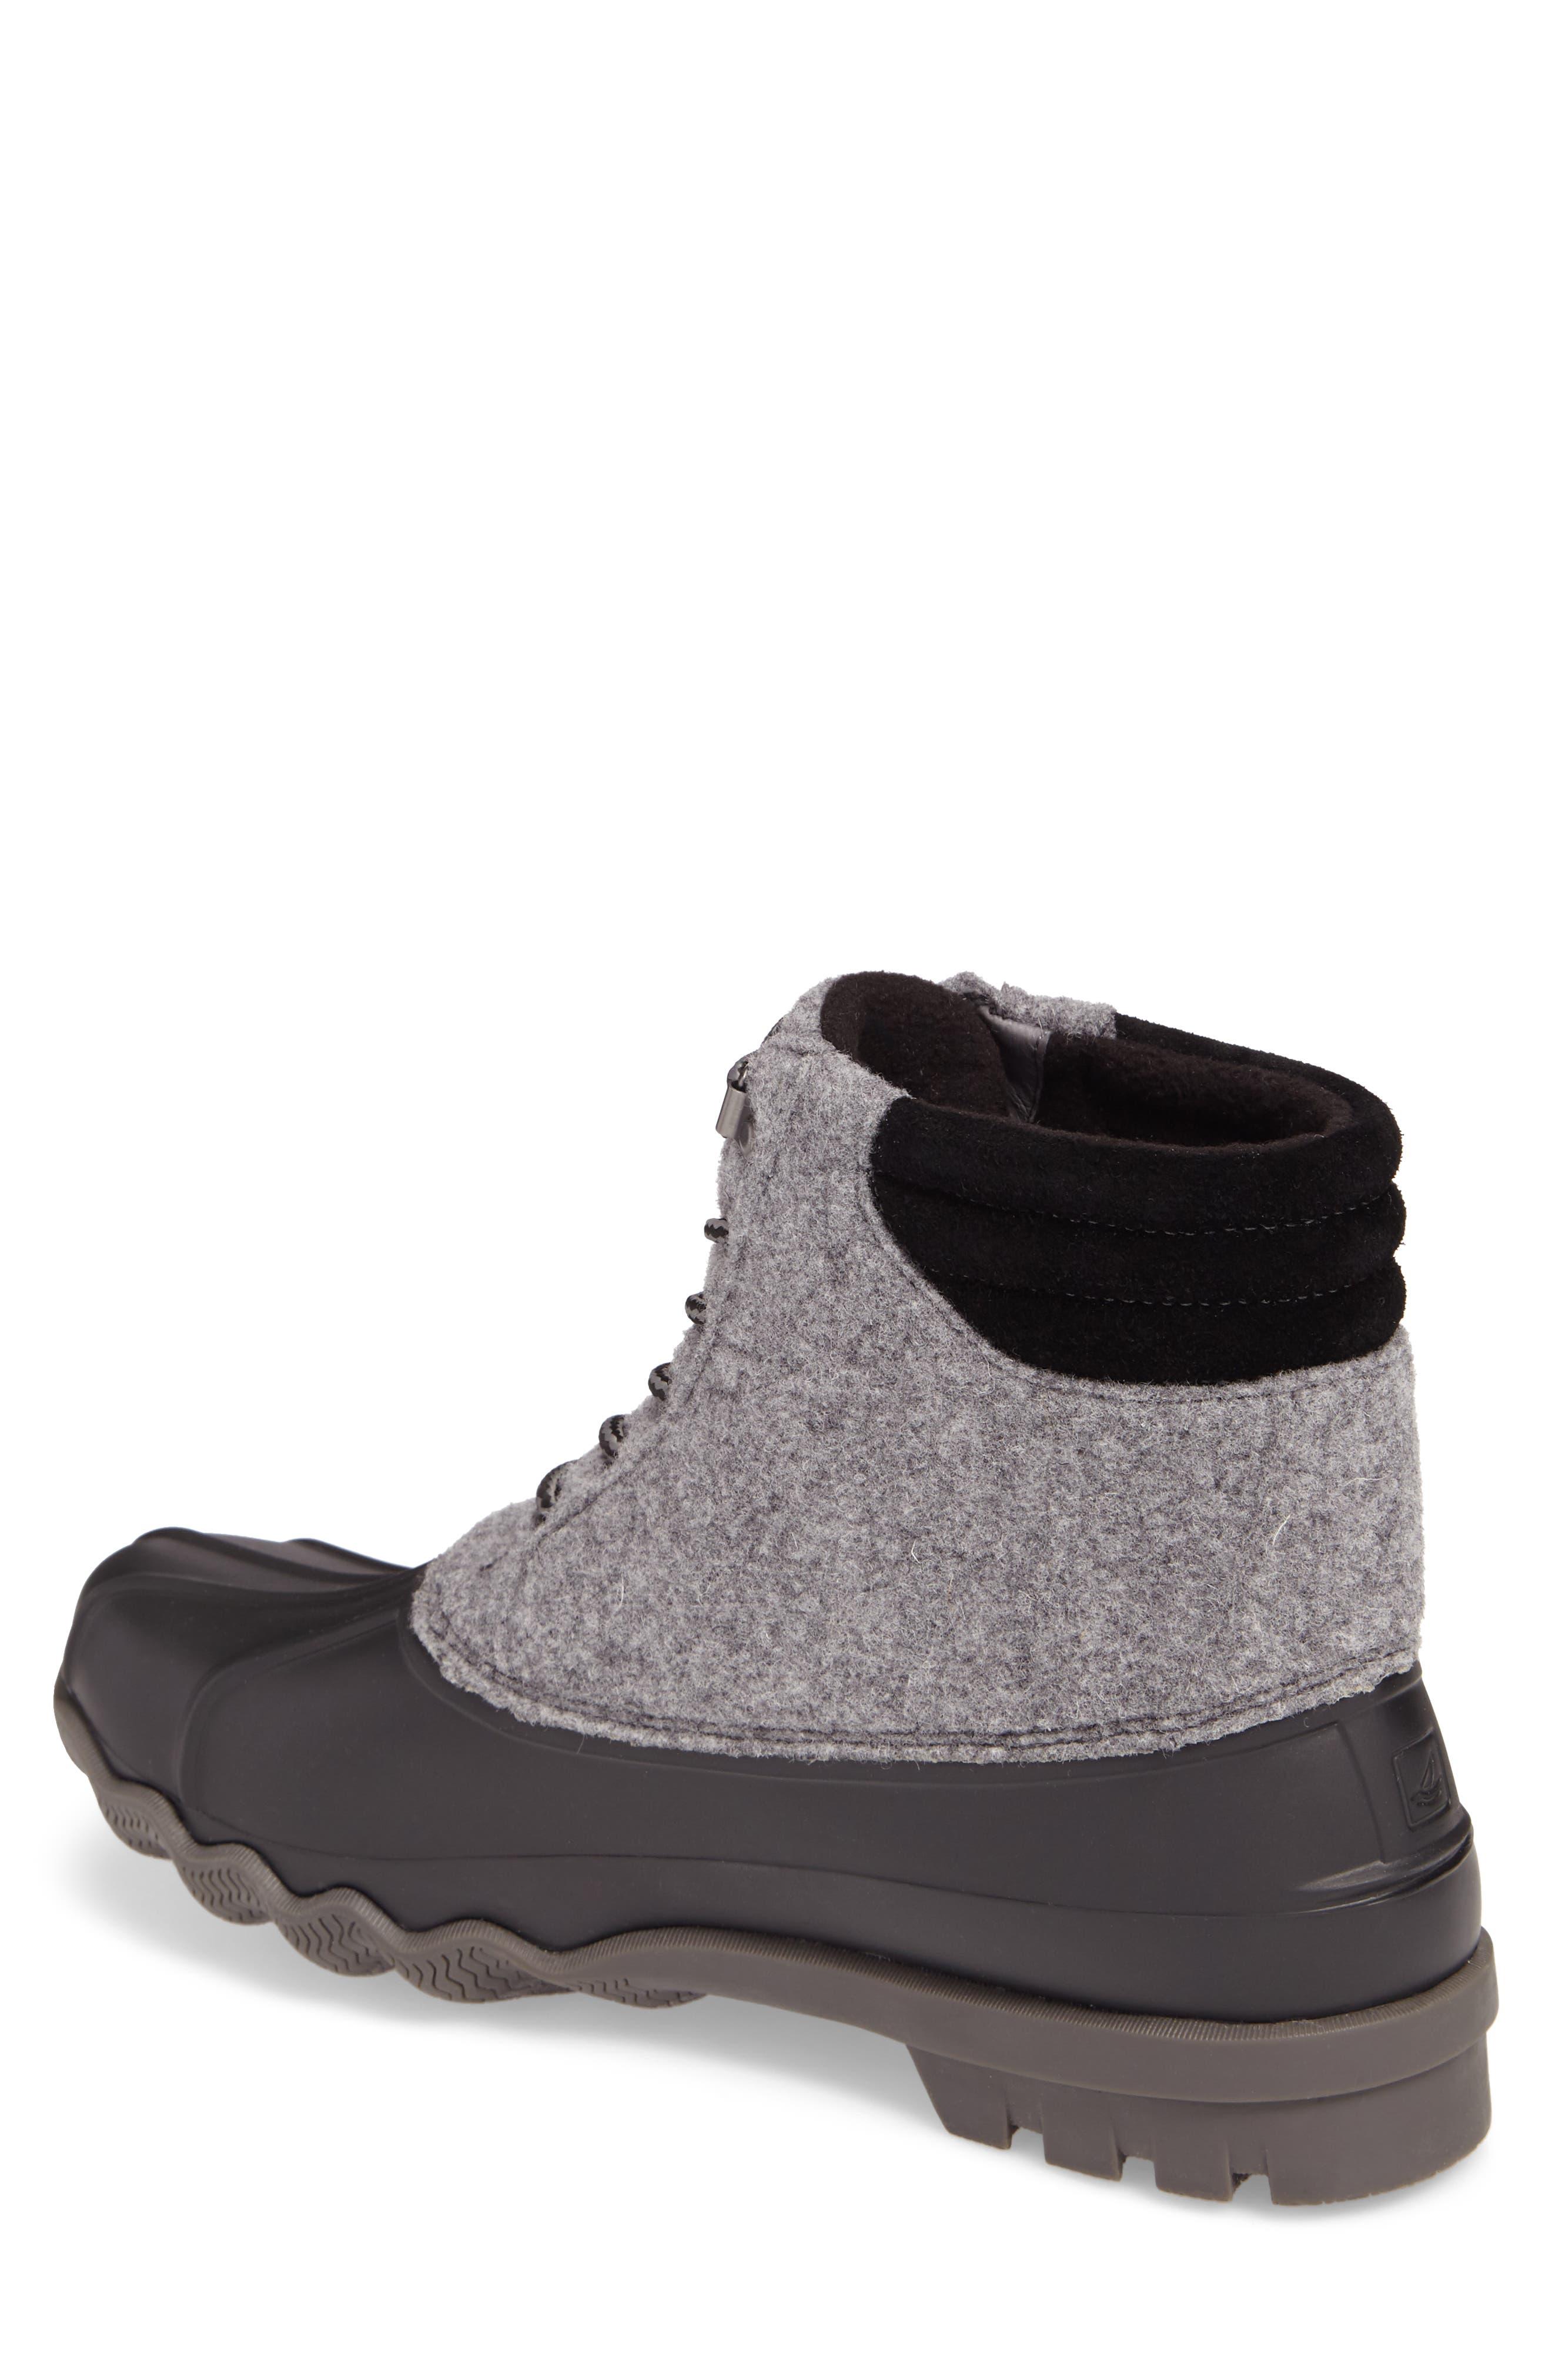 Avenue Rain Boot,                             Alternate thumbnail 2, color,                             Grey Leather